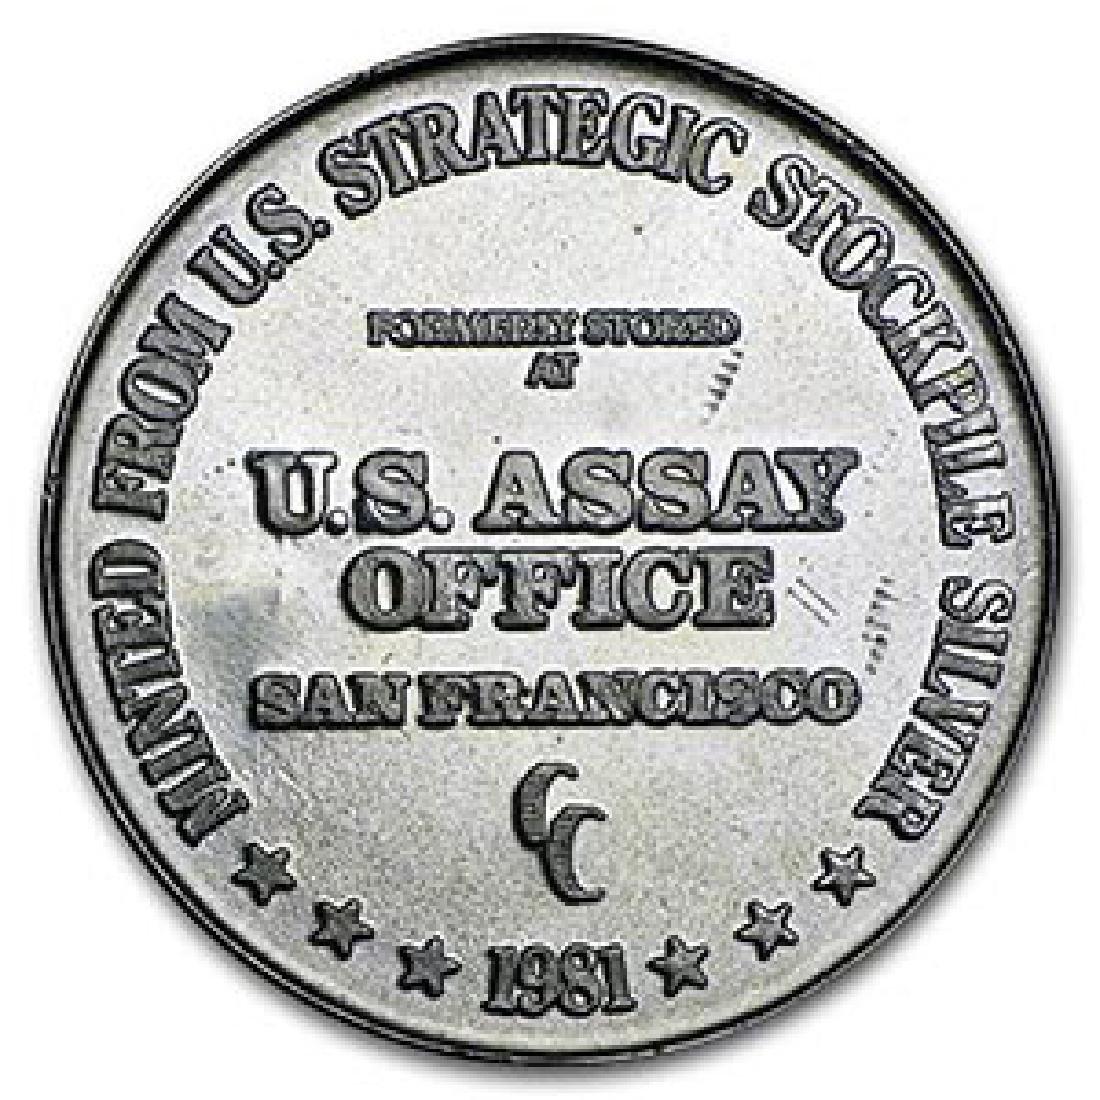 1 oz Silver Round - U.S. Assay Office